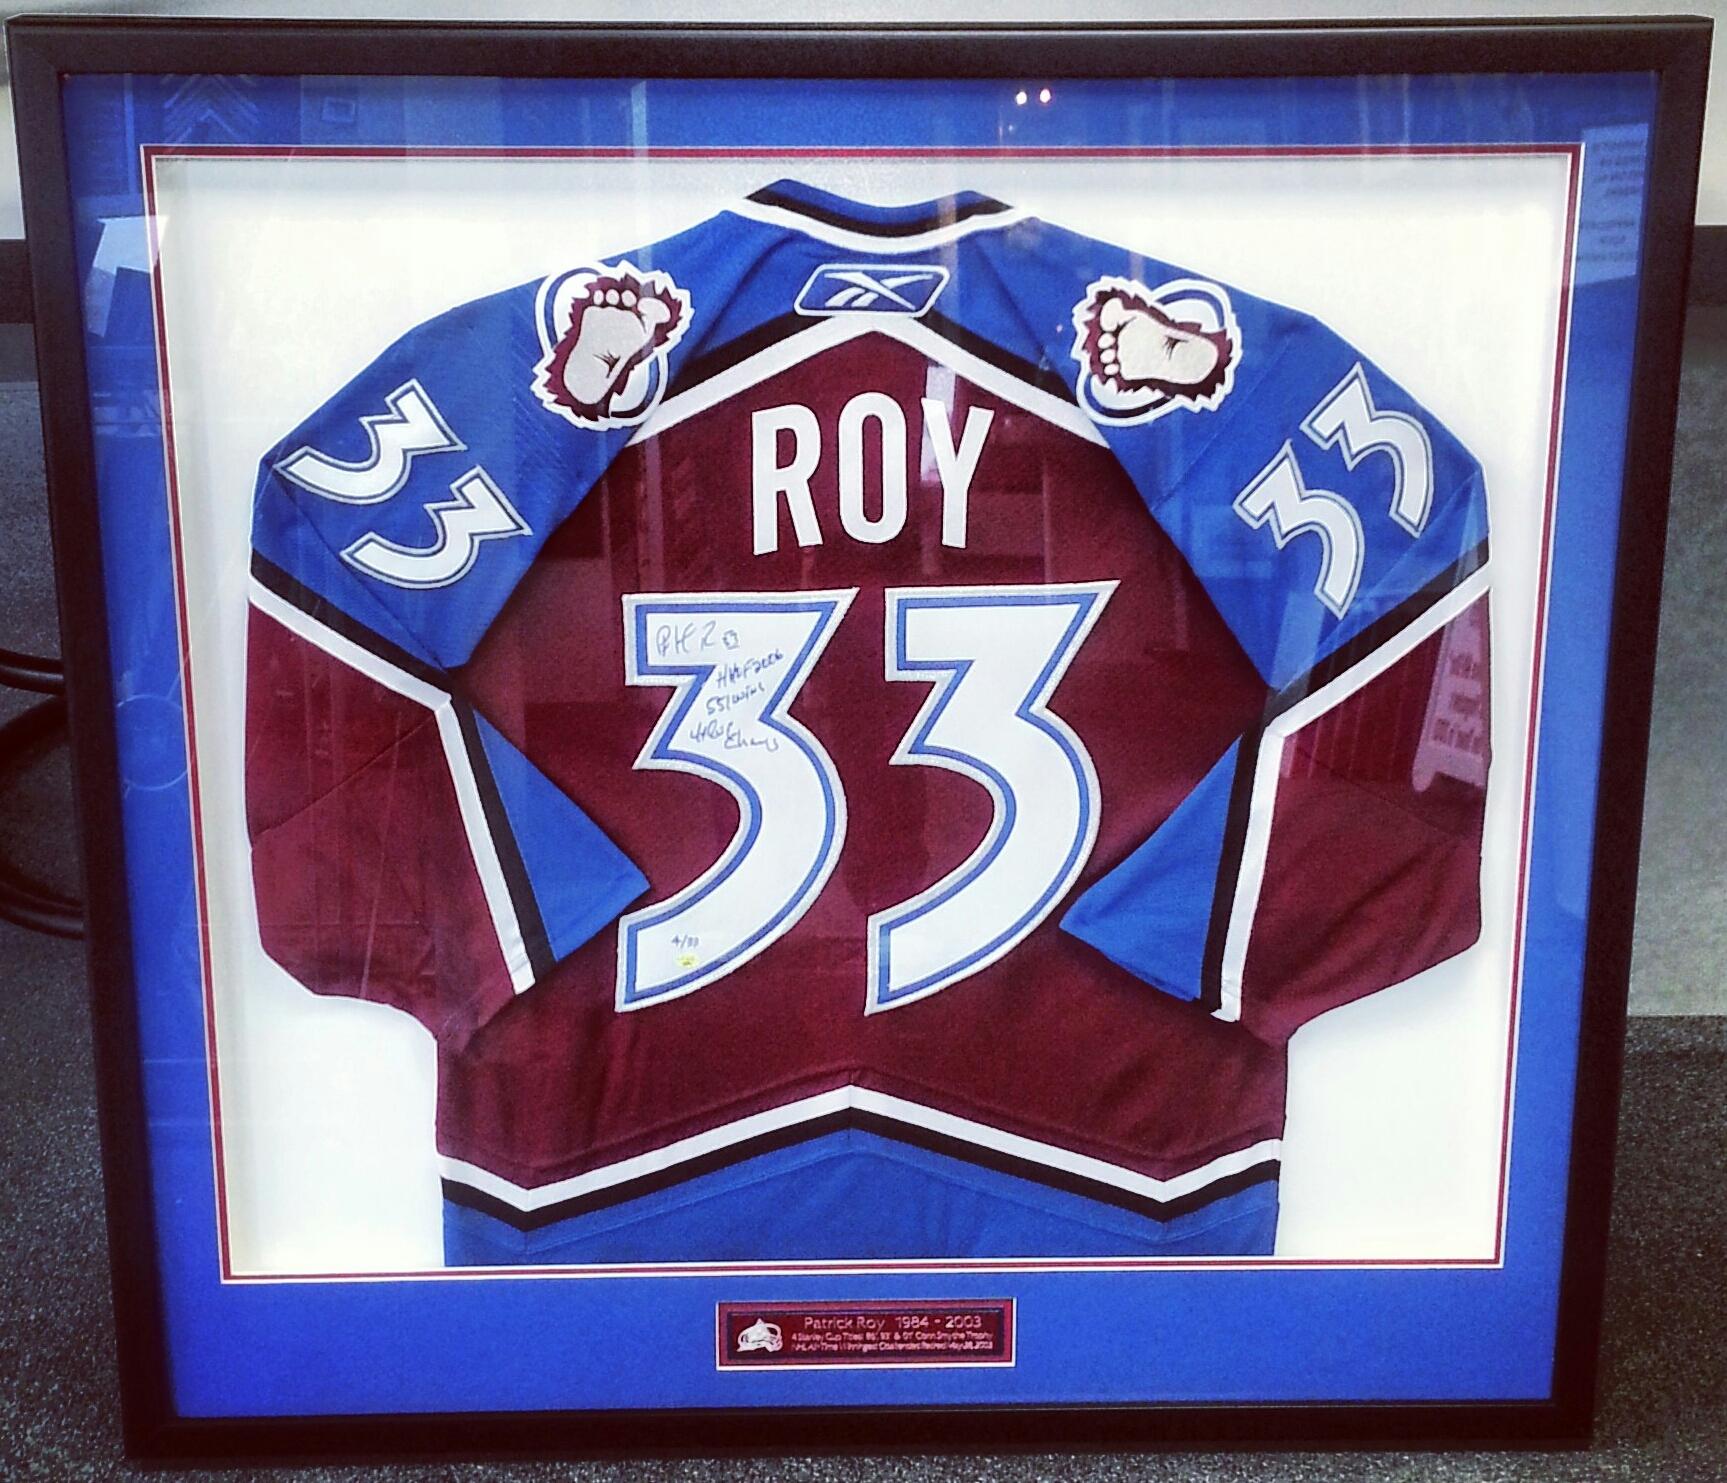 img_20130911_094505 1 custom framed patrick roy authentic colorado avalanche hockey jersey